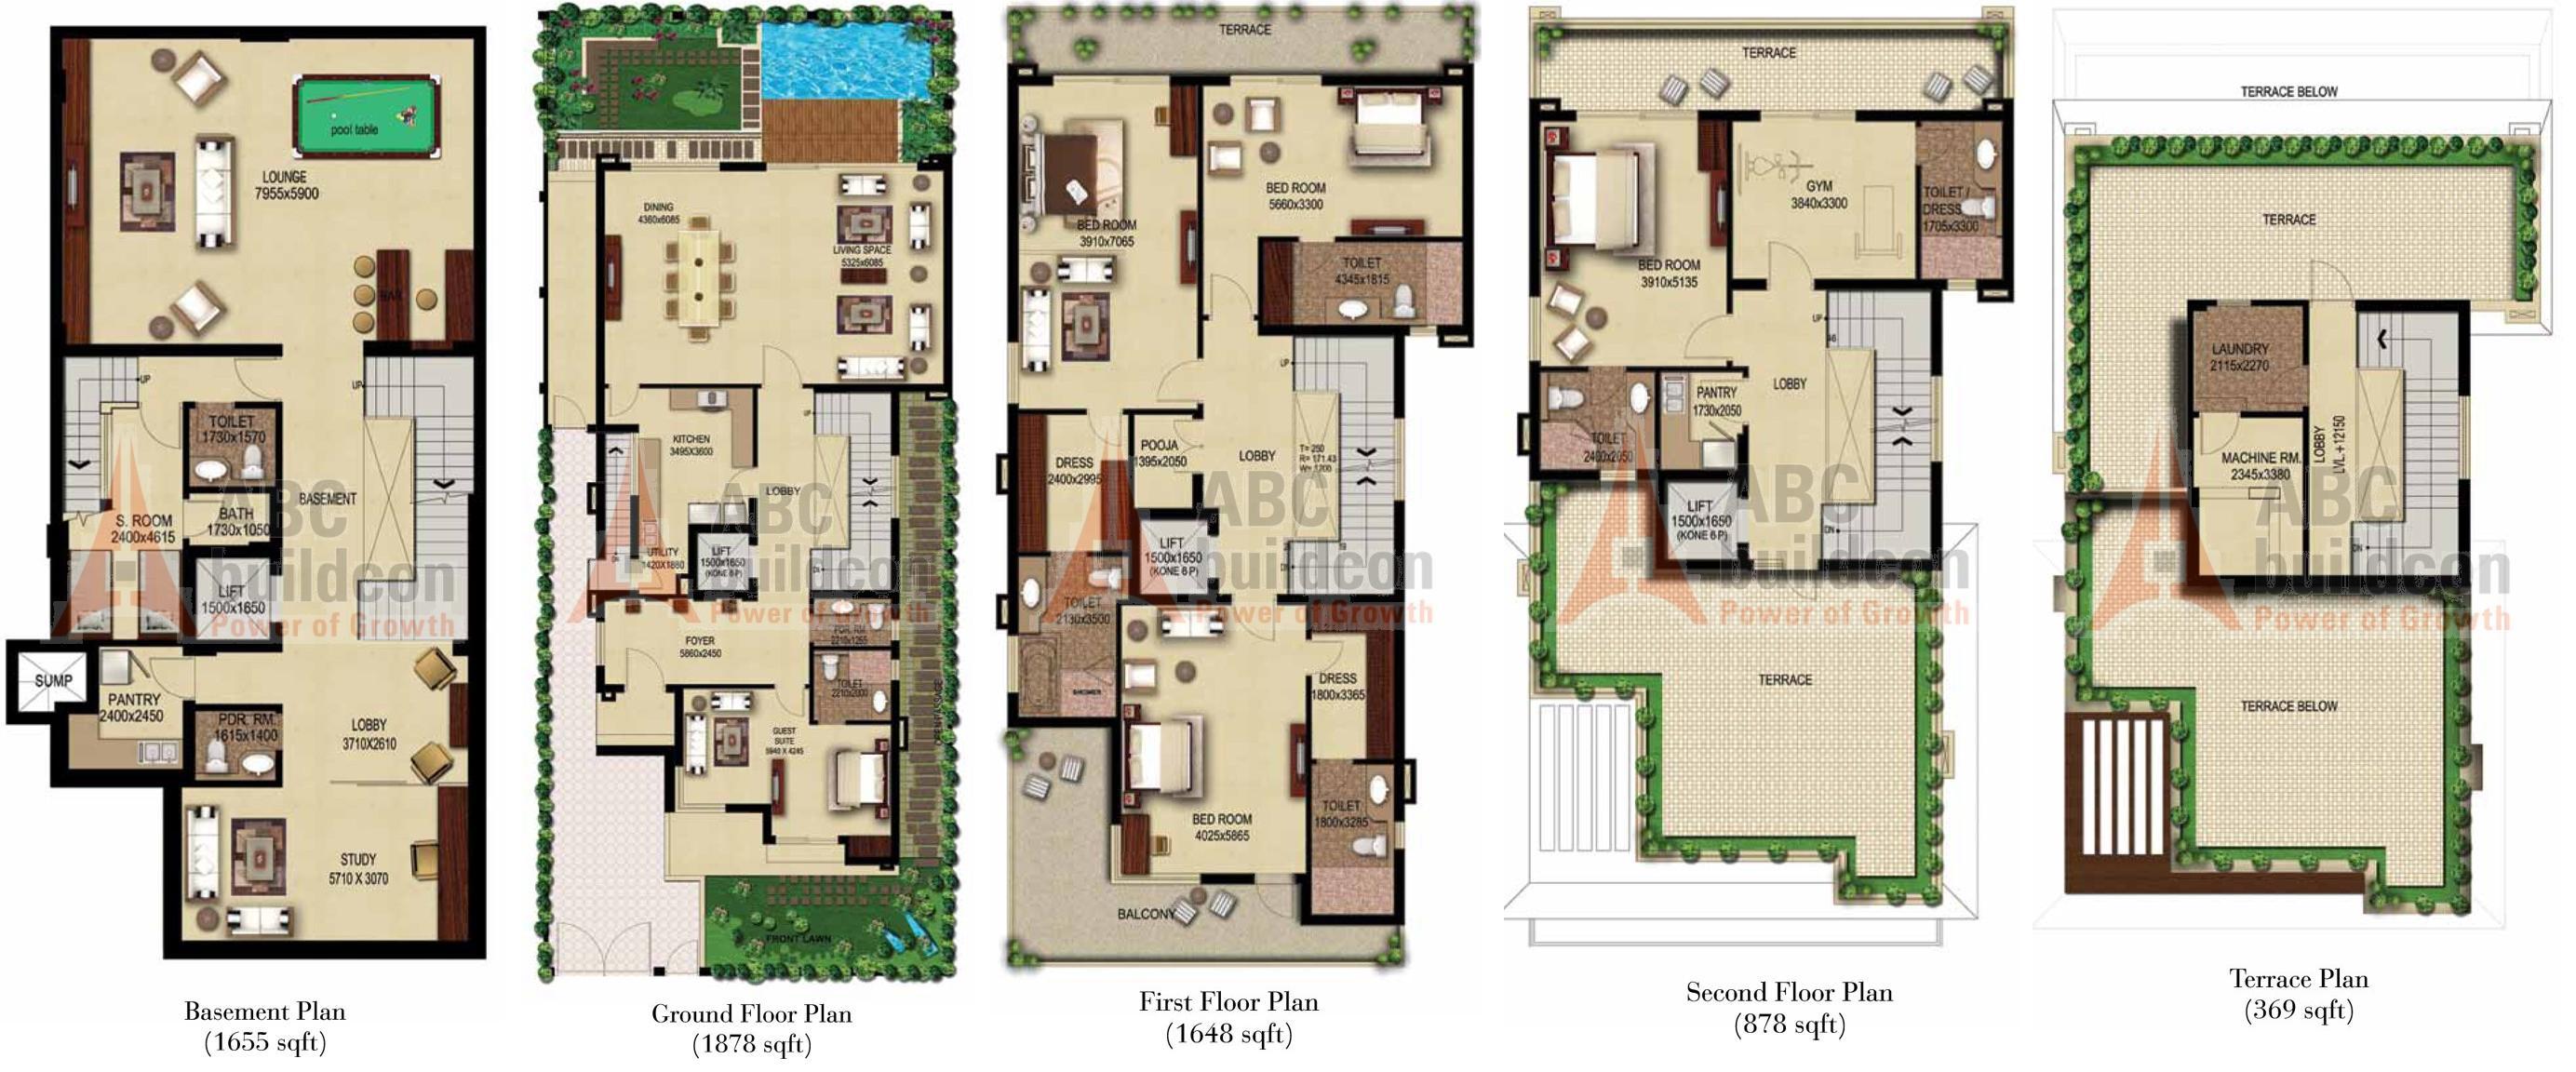 Anant raj estate villas sector 63a gurgaon for Villa floor plans india